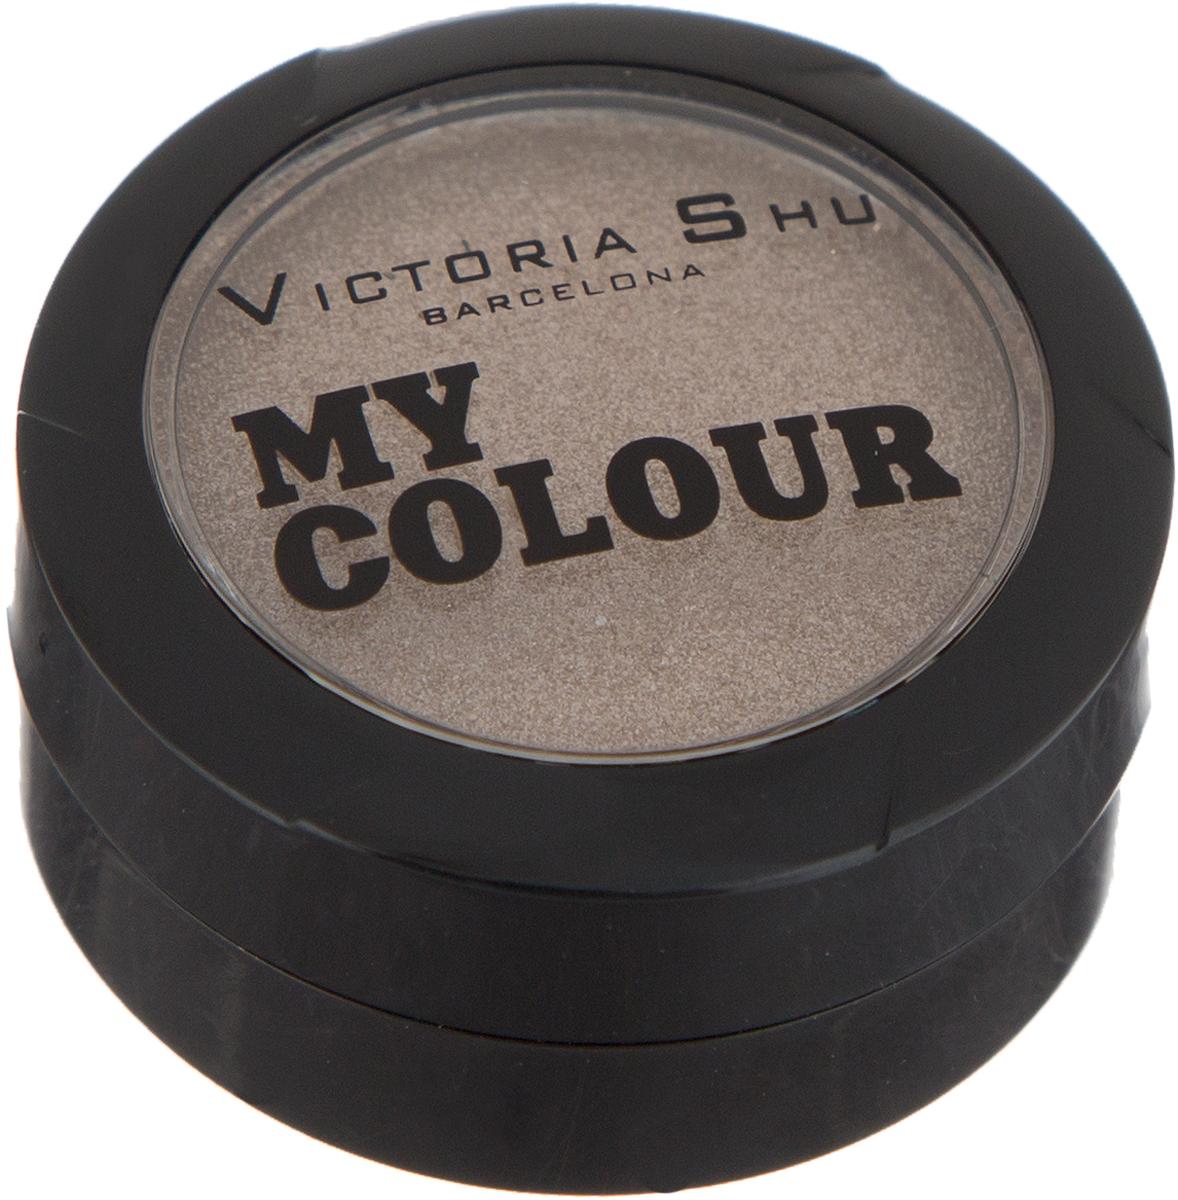 Victoria Shu Тени для век My Colour, тон № 515, 2,5 г тени victoria shu тени для век my colour 519